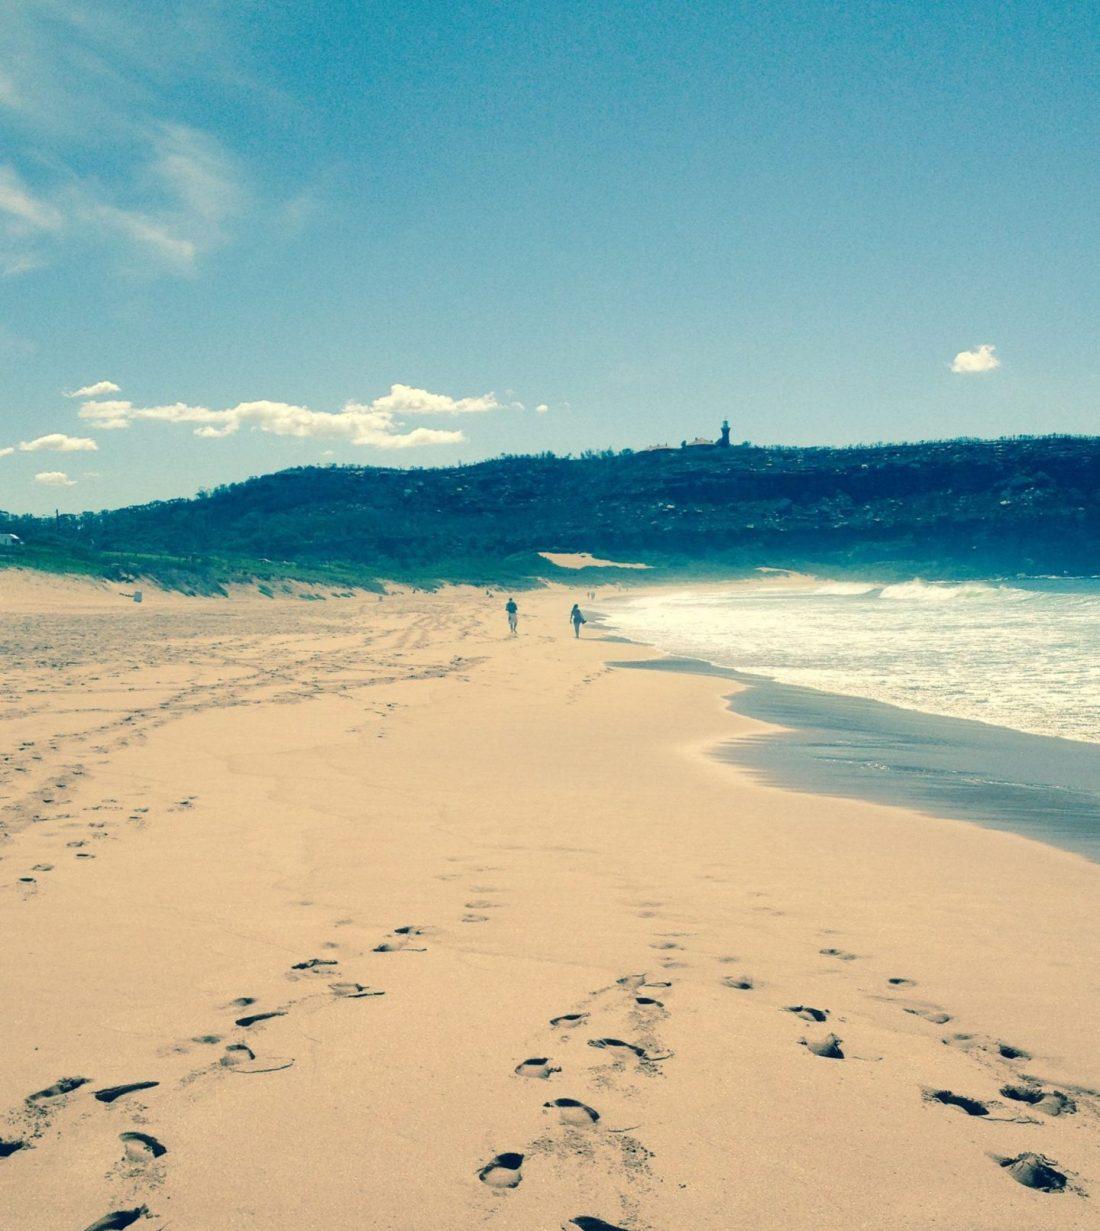 Barrenjoey on the beach